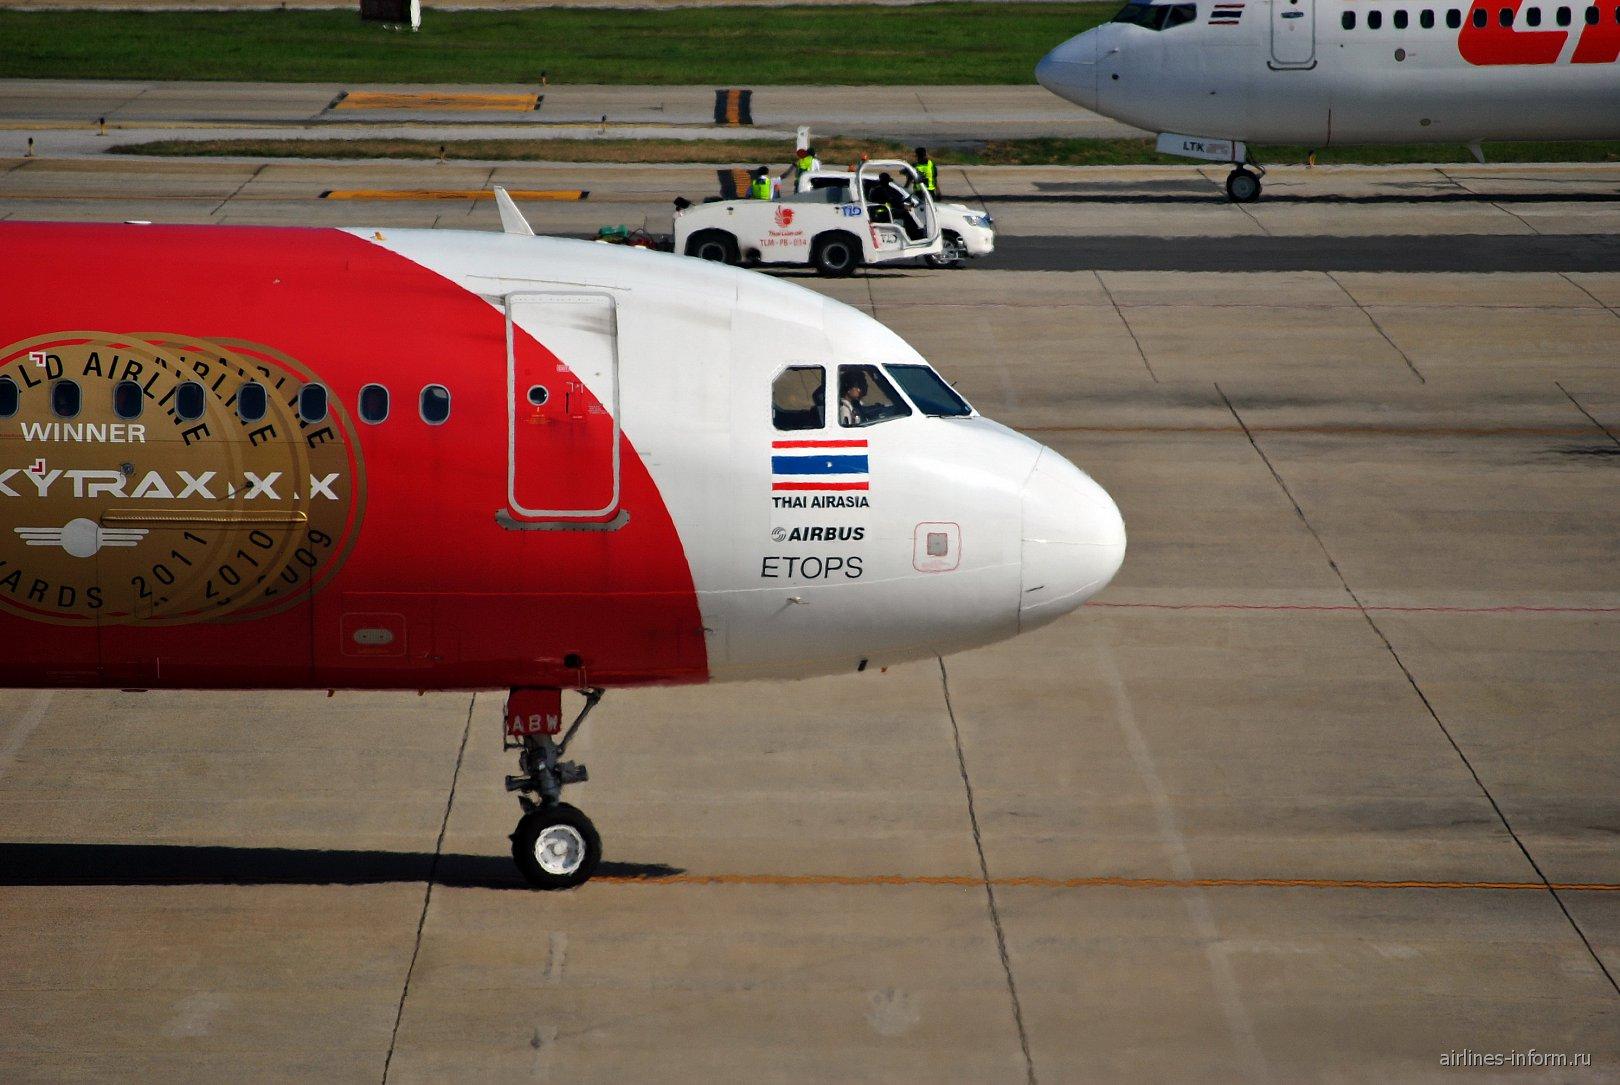 Airbus A320 авиакомпании Thai AirAsia в аэропорту Бангкока